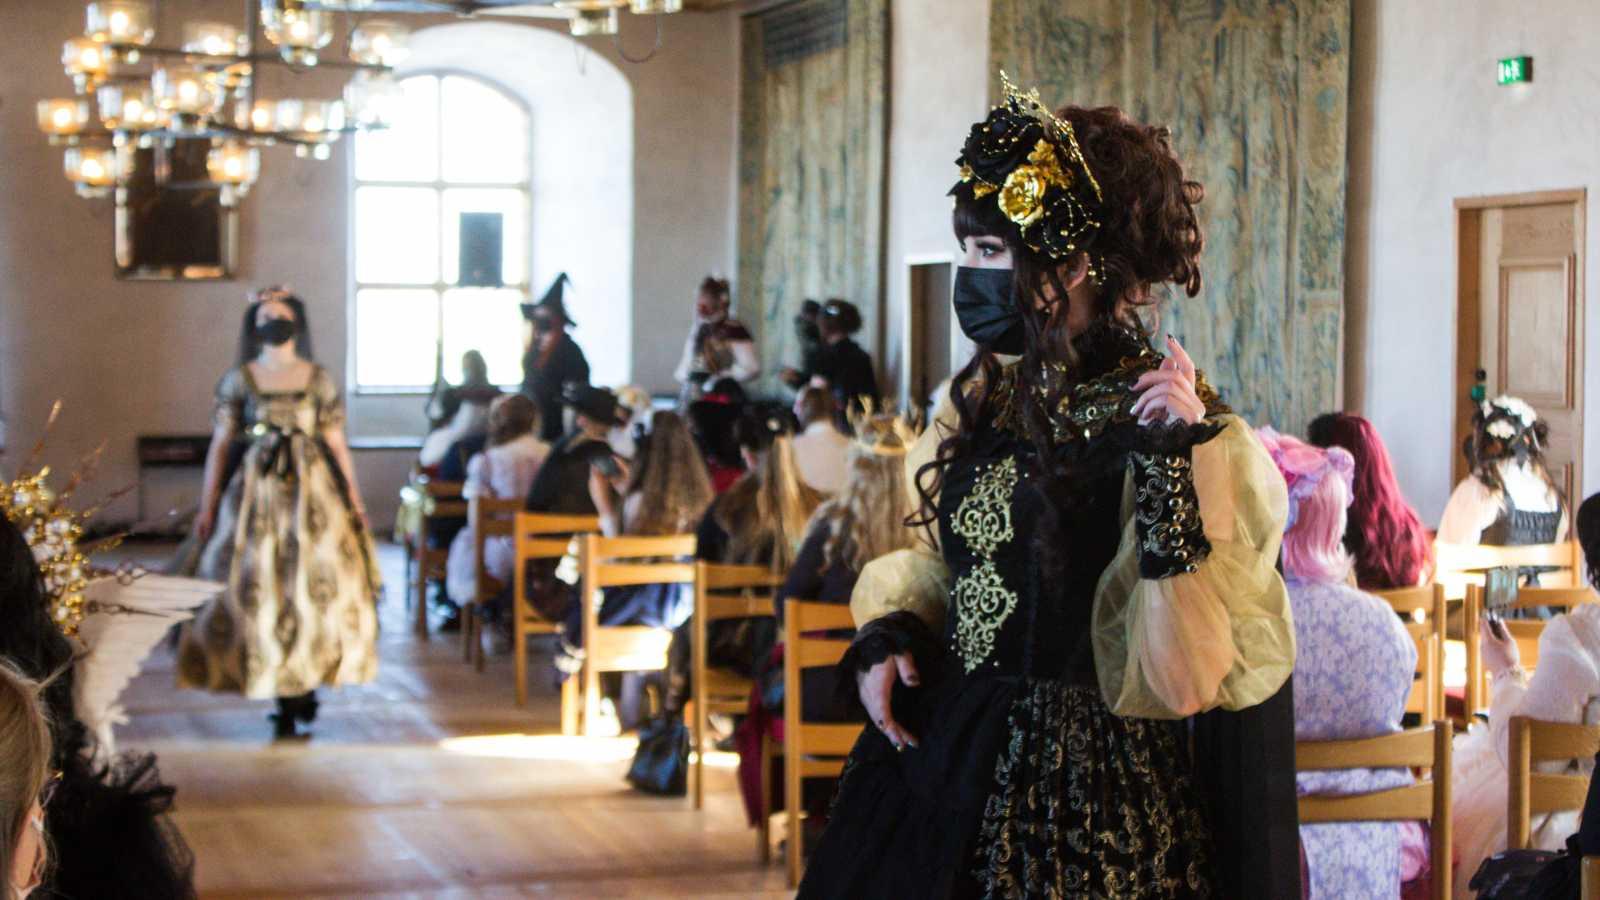 Kuvareportaasi: Domus Reginae -lolitamuotitapahtuma